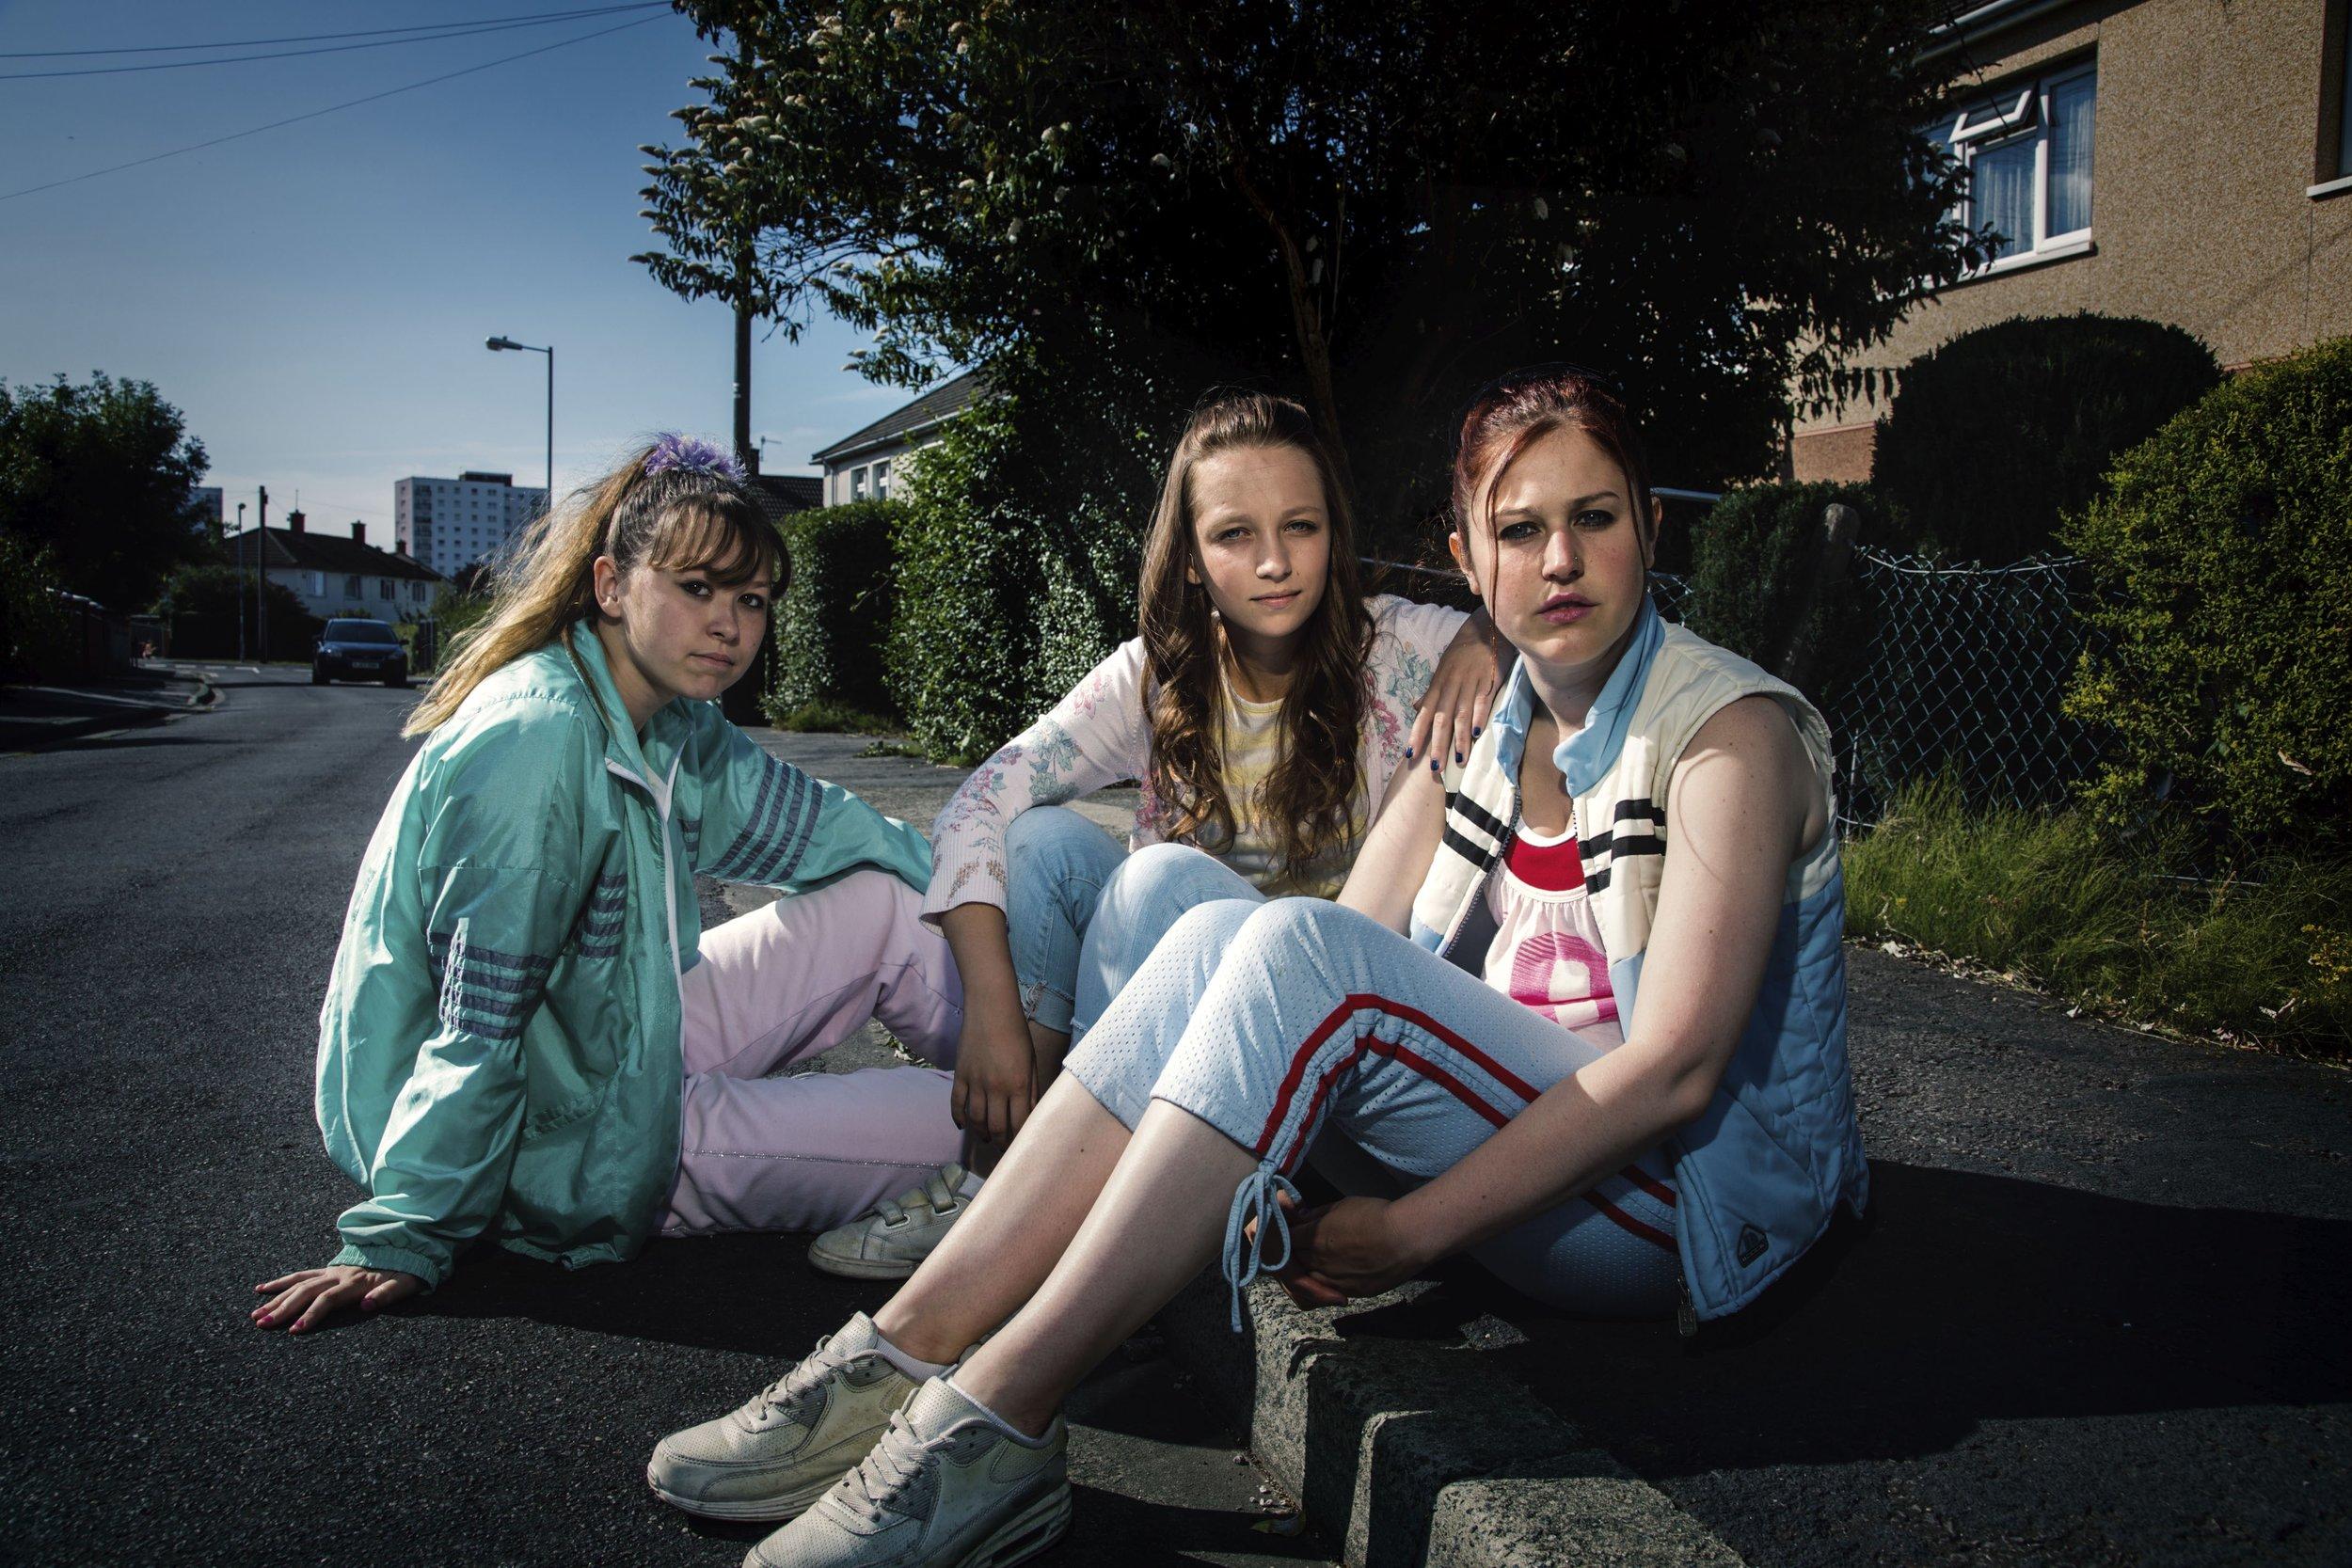 Three-Girls_final_image credit BBC & Ewen Spencer-s.jpg